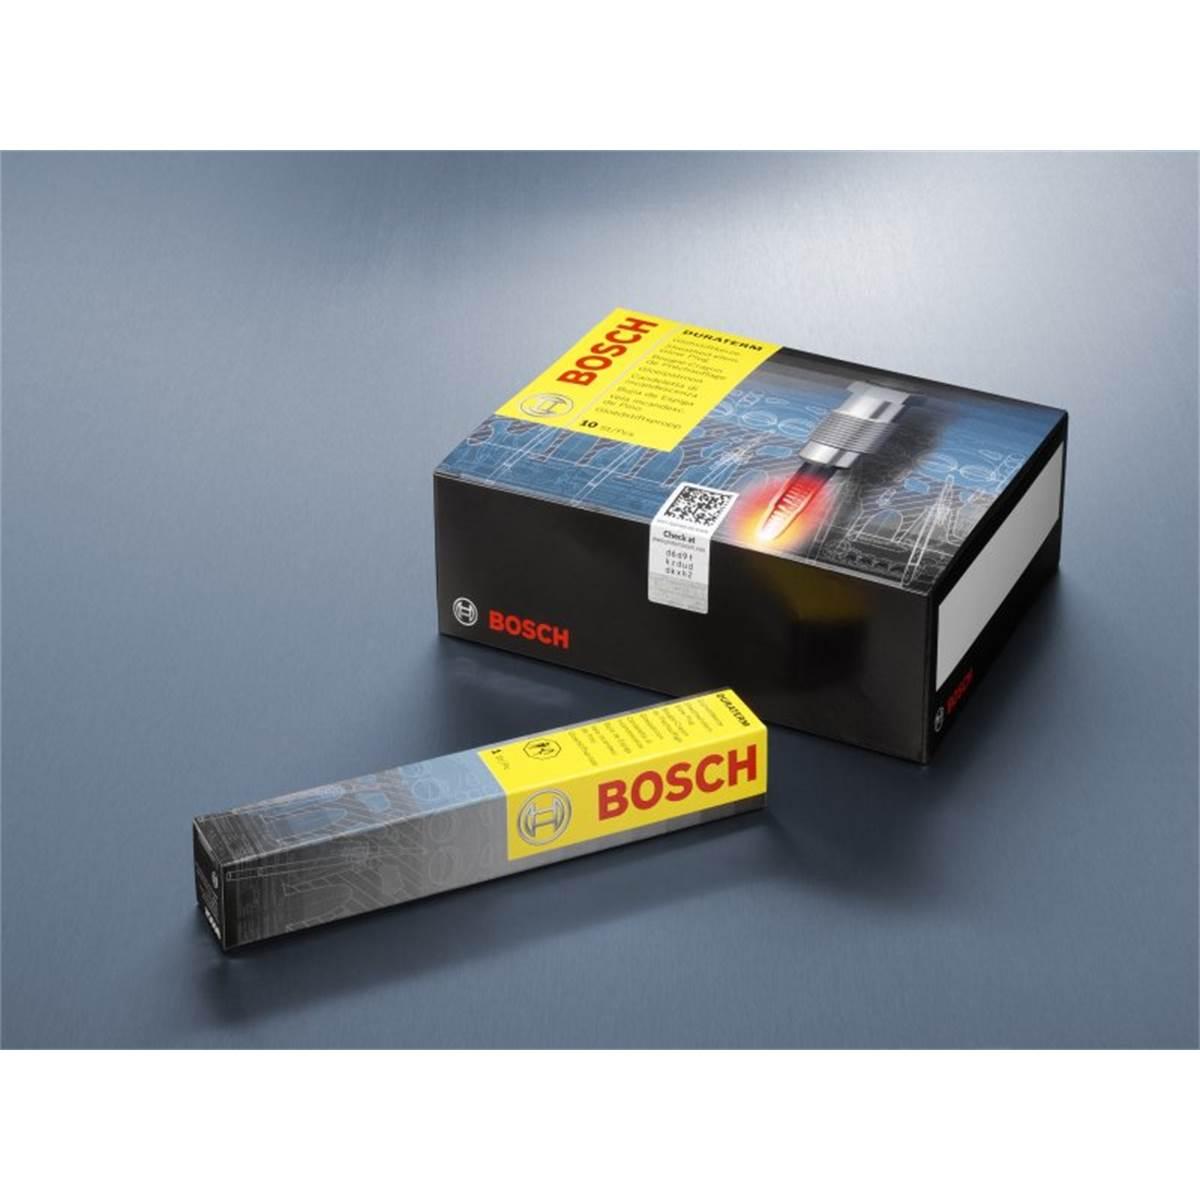 Bougie de préchauffage Bosch N°2022